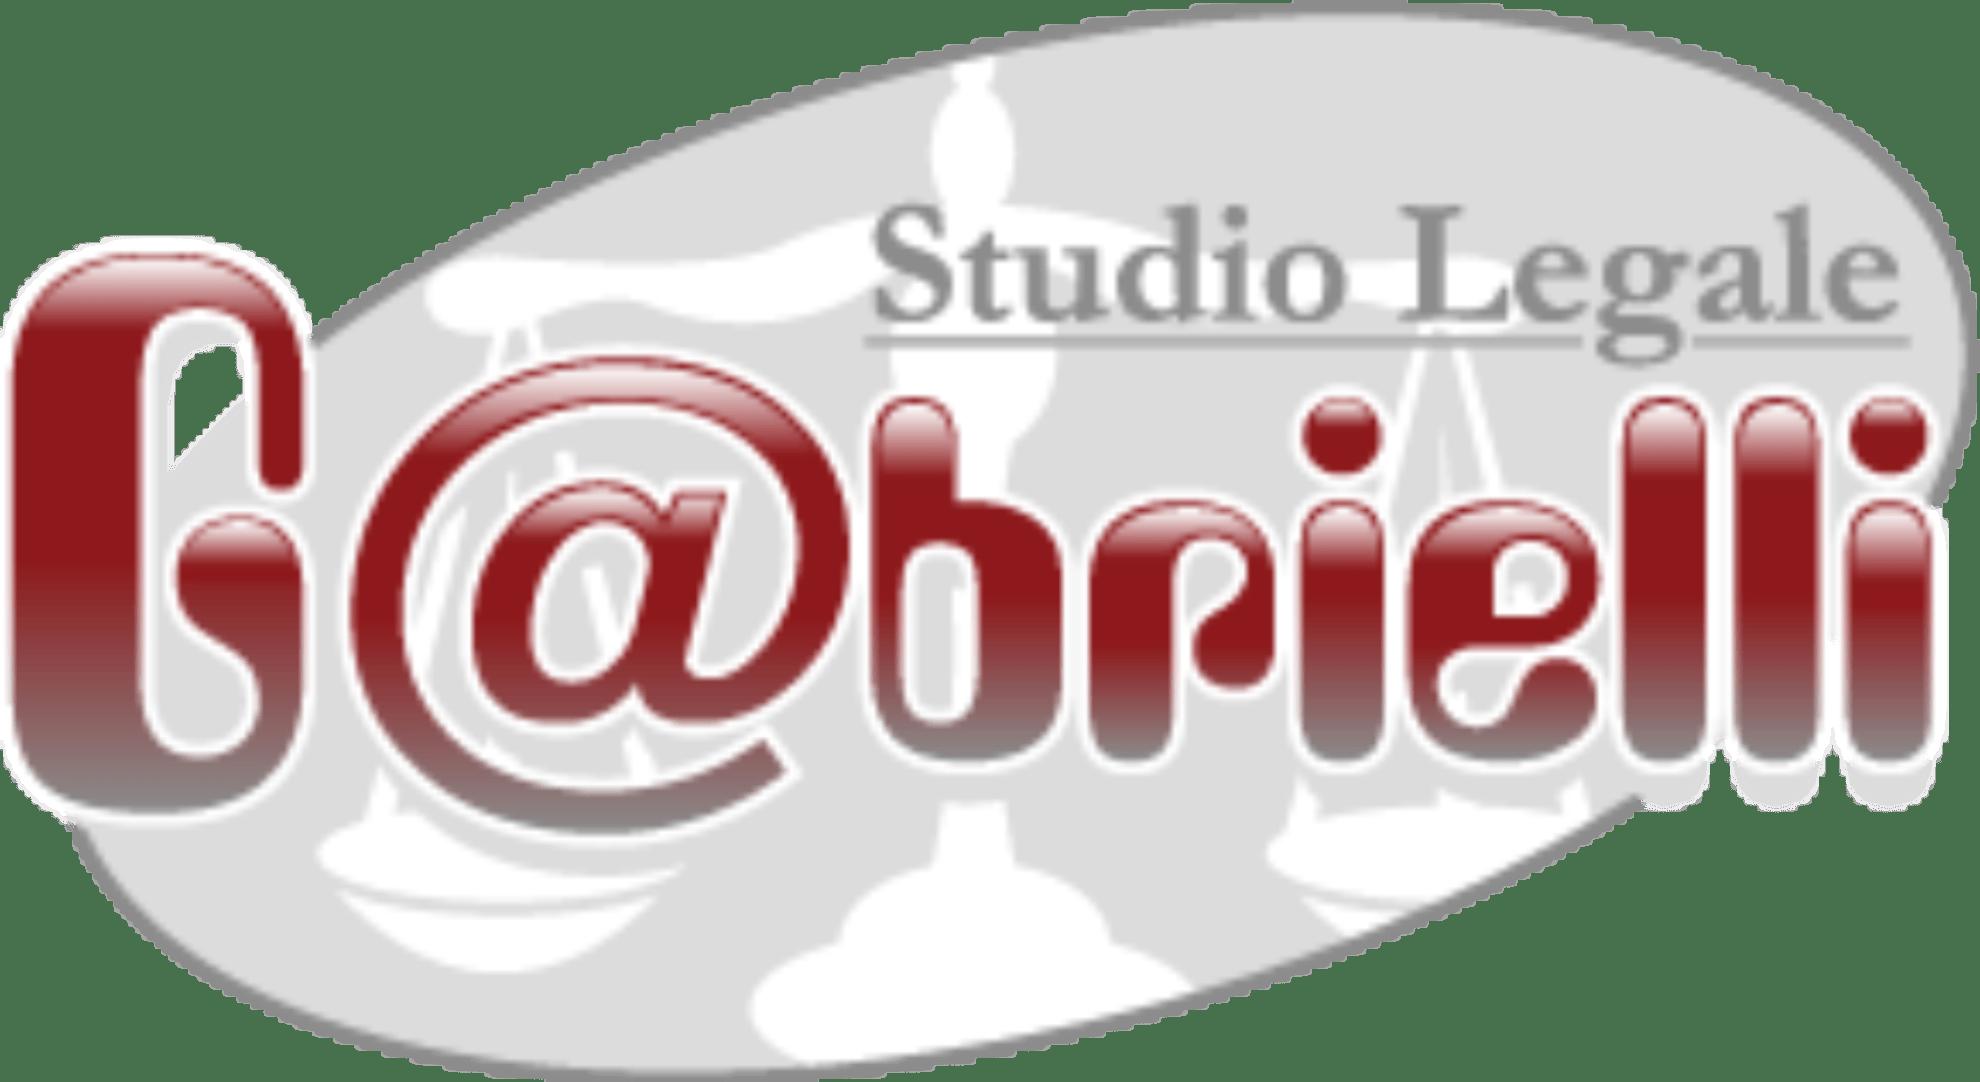 Studio Legale Gabrielli